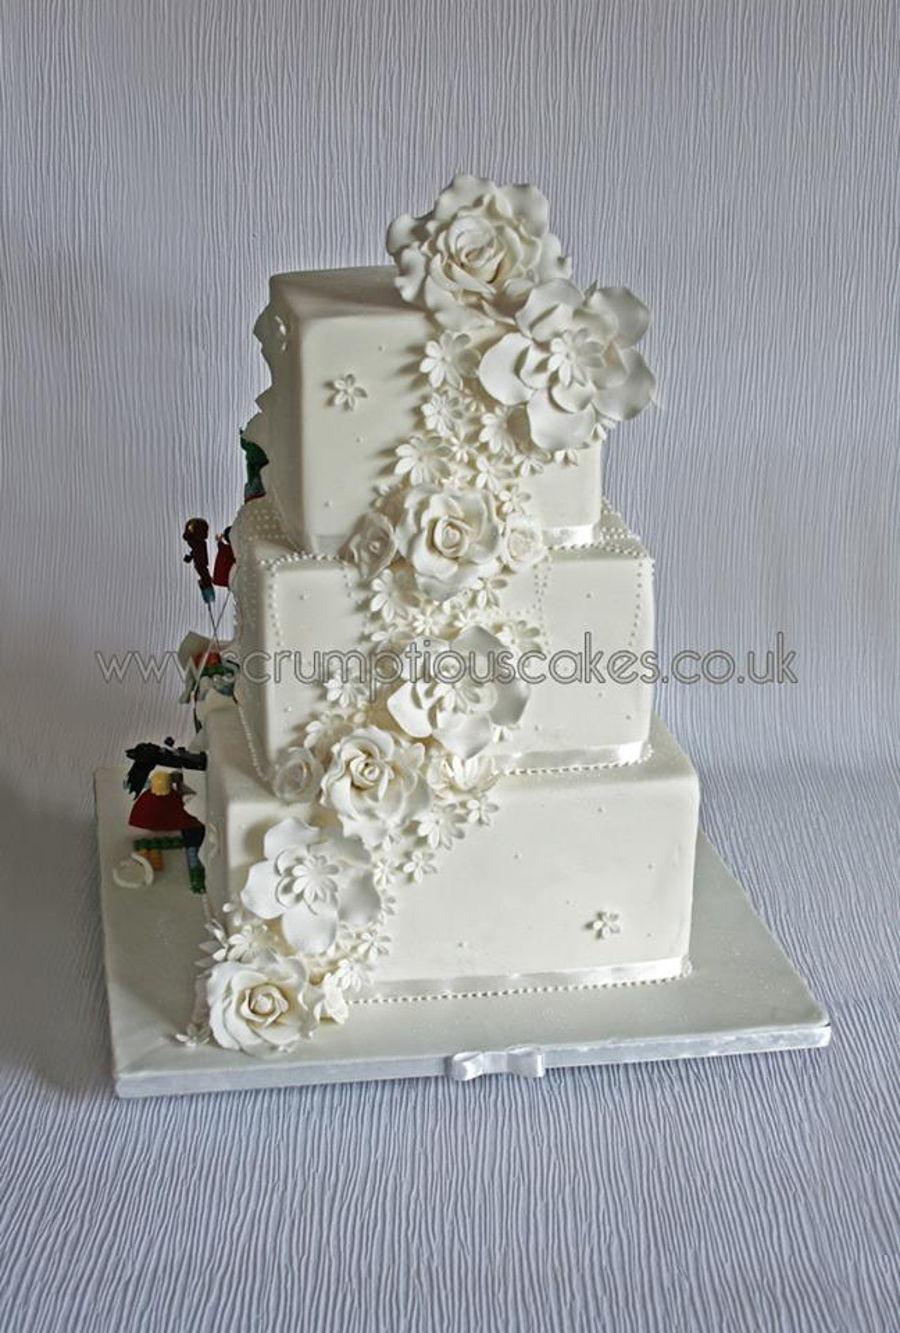 lego superhero wedding cake. Black Bedroom Furniture Sets. Home Design Ideas